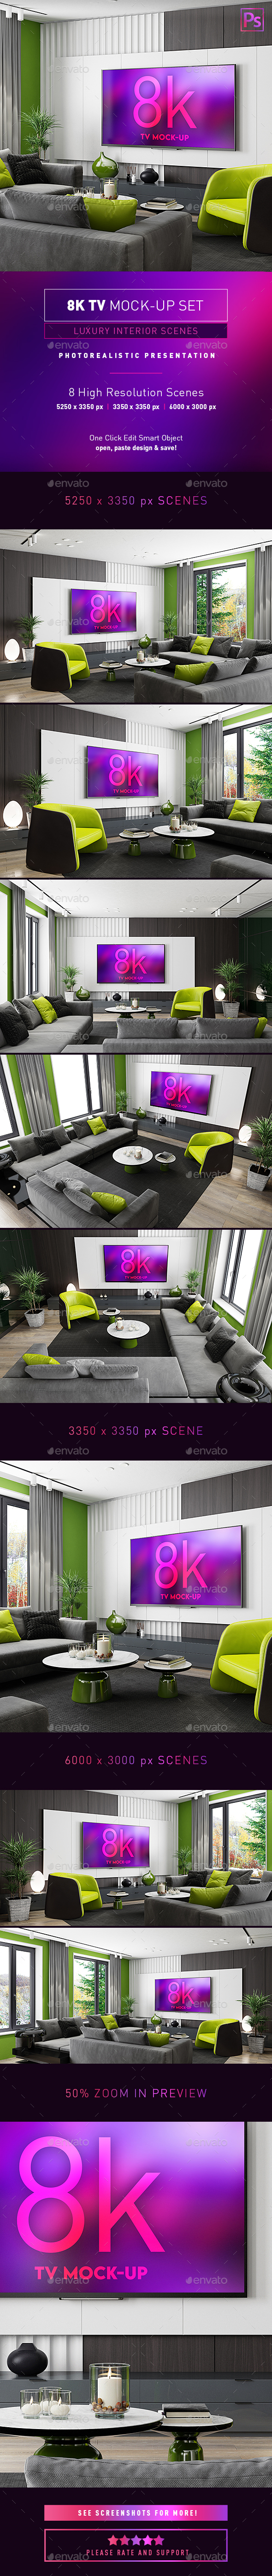 8k TV Mock-Up Luxury Interior Scenes